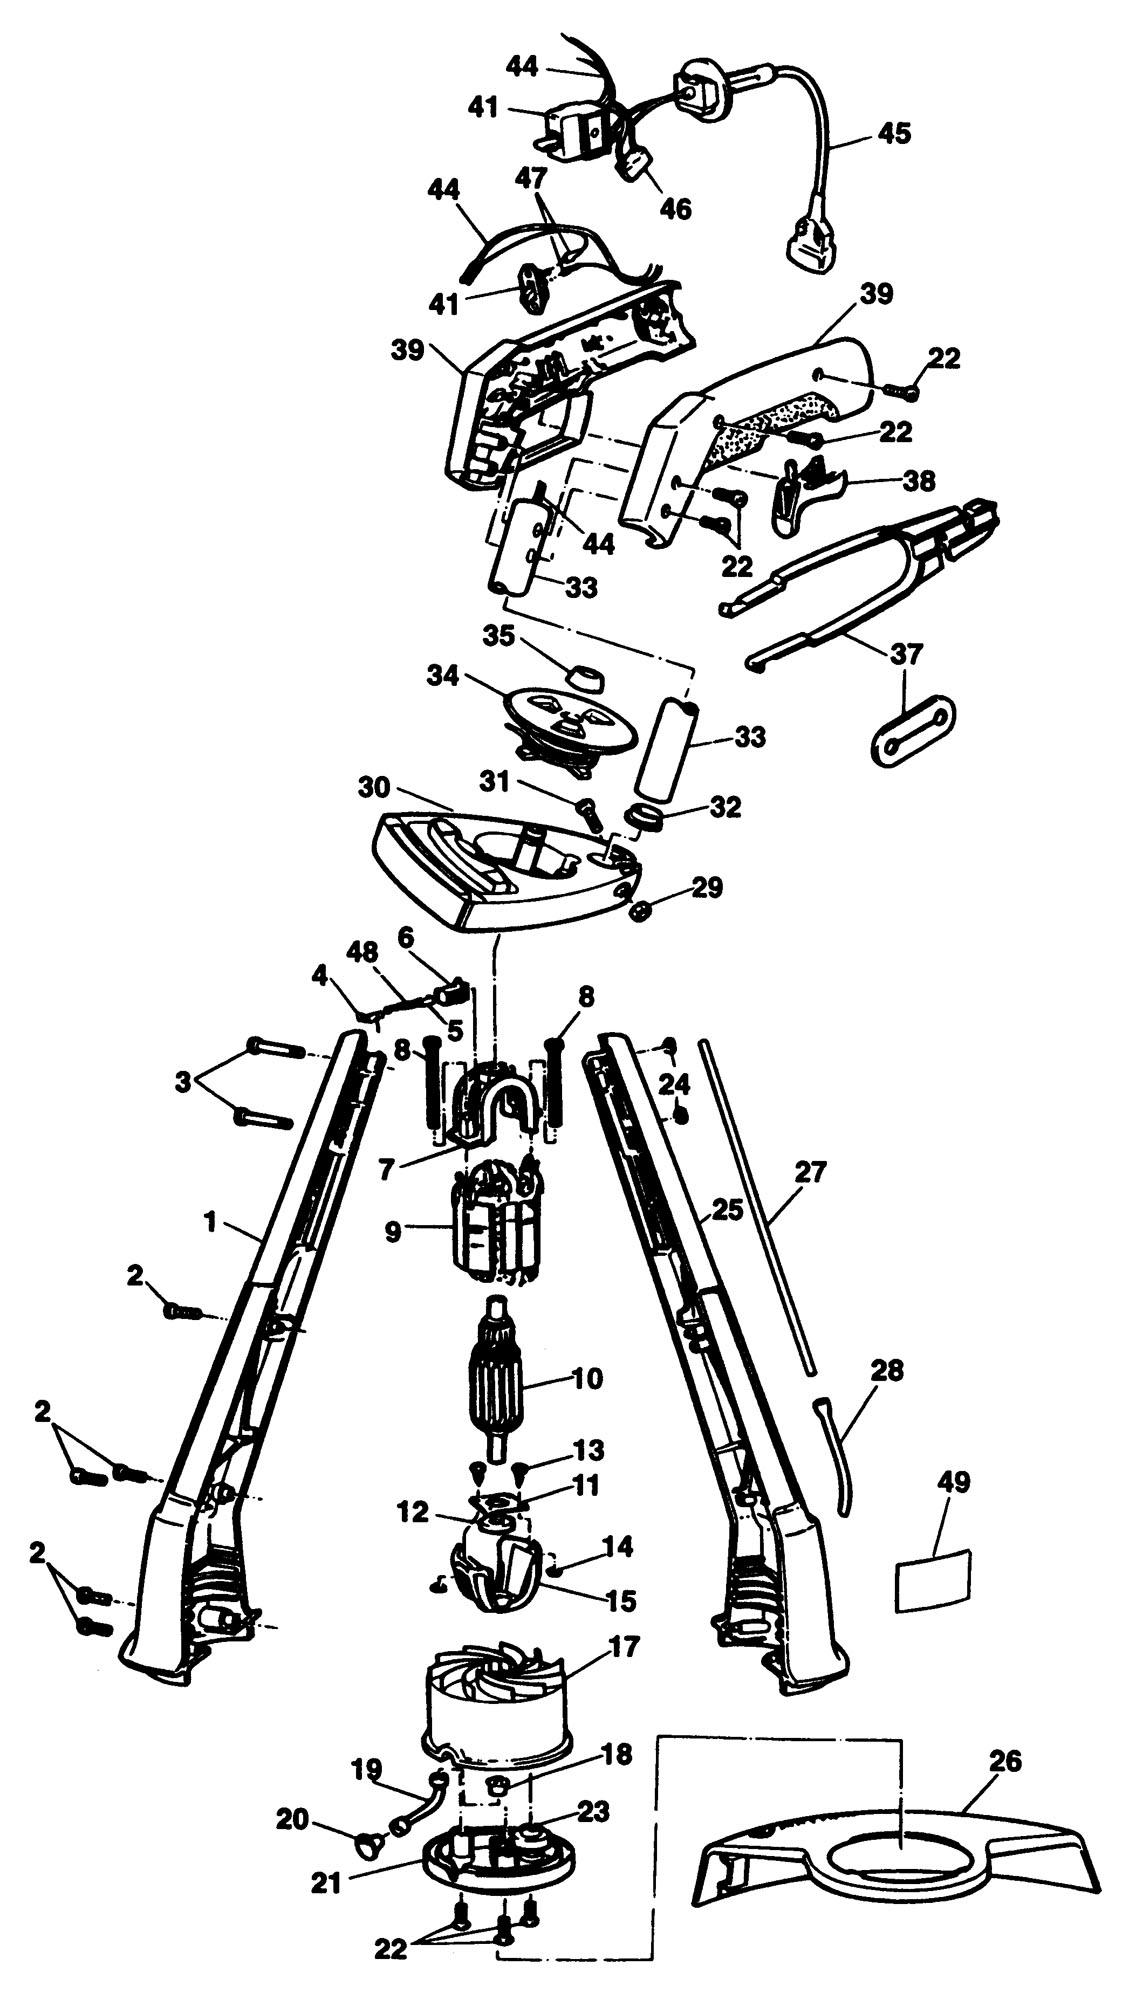 Spares For Black Amp Decker String Trimmer Type 1